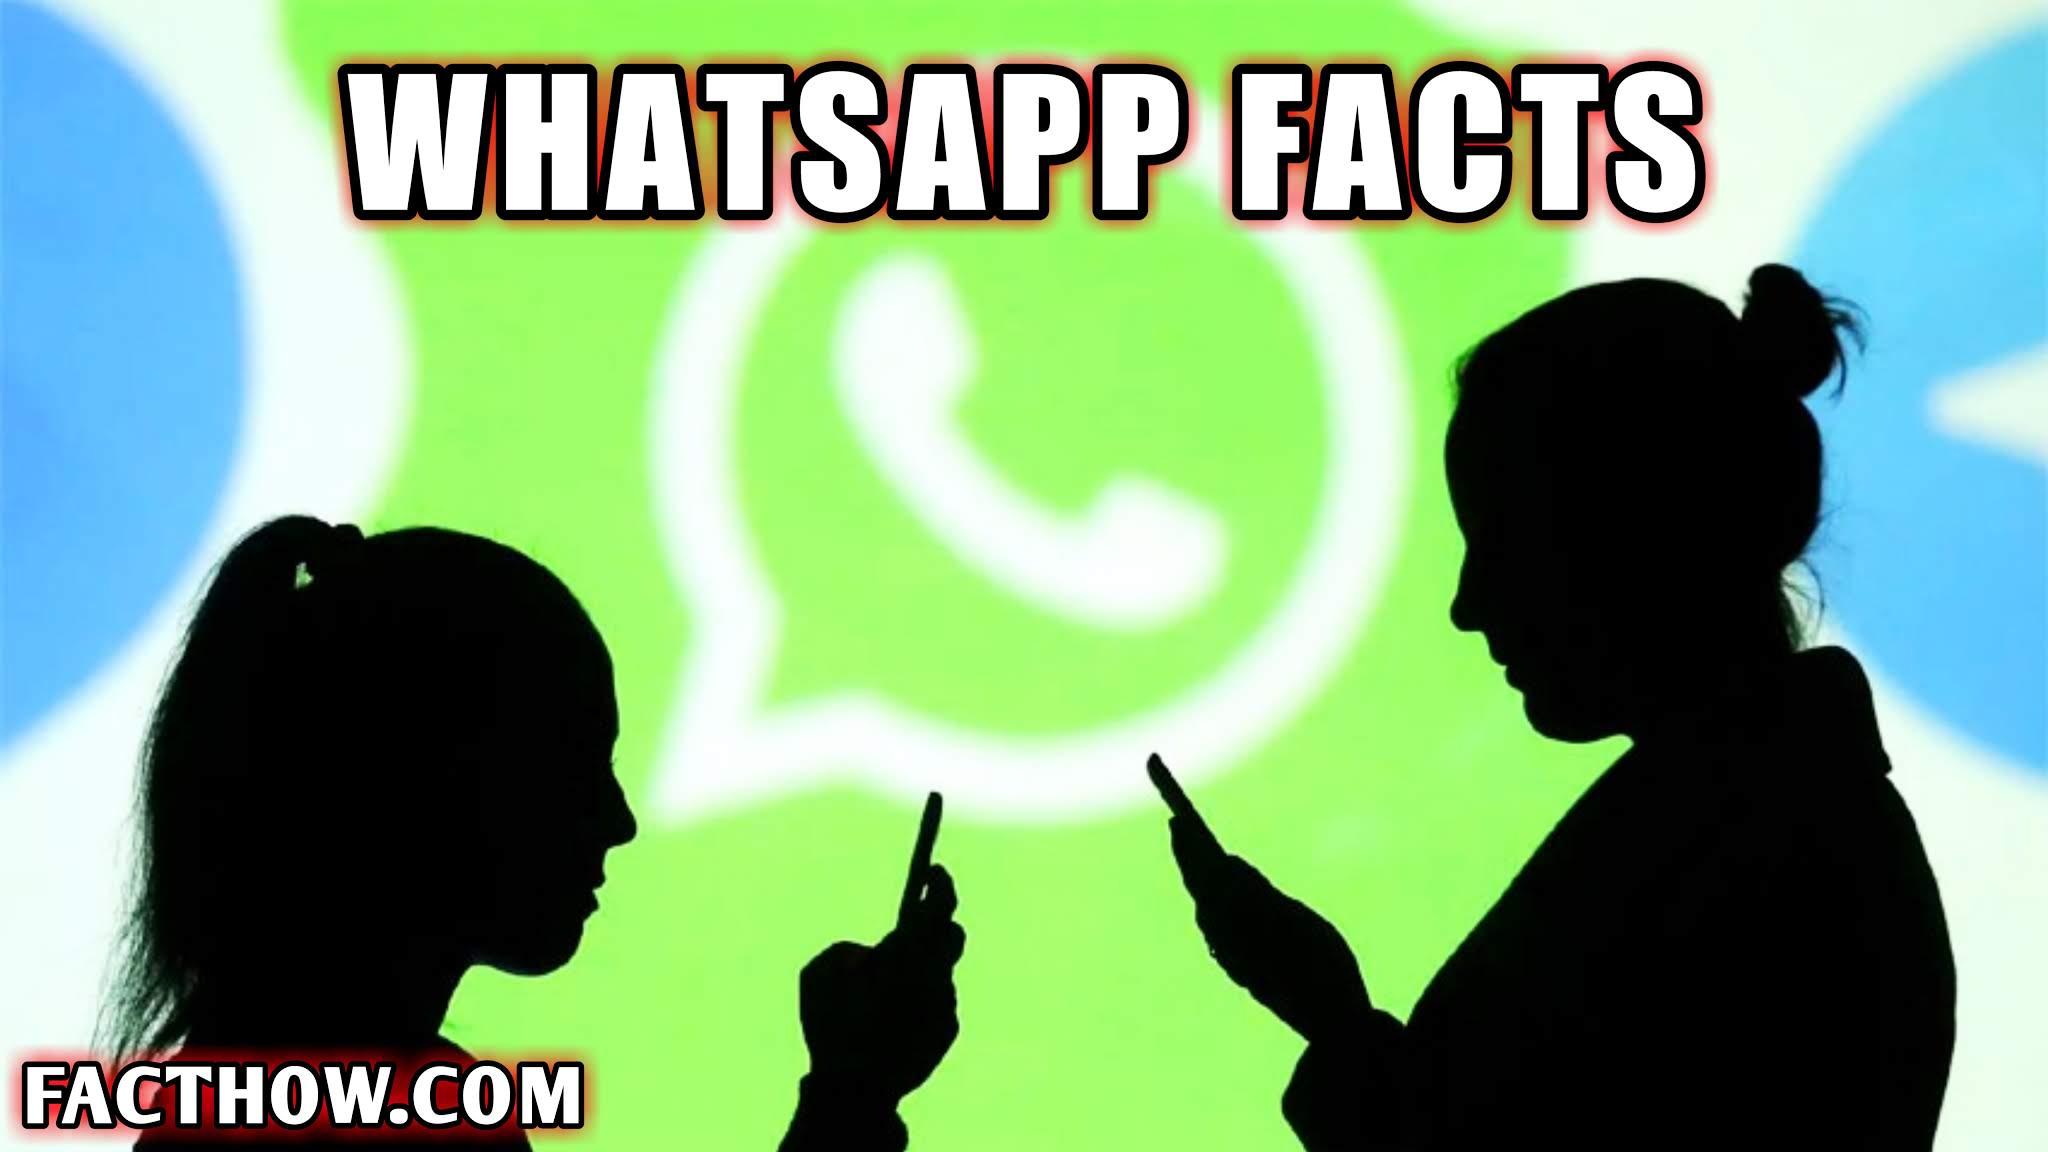 Whatsapp-fun-facts-hindi-whatsapp-earn-money-hindi-rochak-tathya-post-fact-how-facthow-interesting-amazing-fun-facts-gb-whatsapp-mod-whatsapp-gold-plus-whatsapp-mod